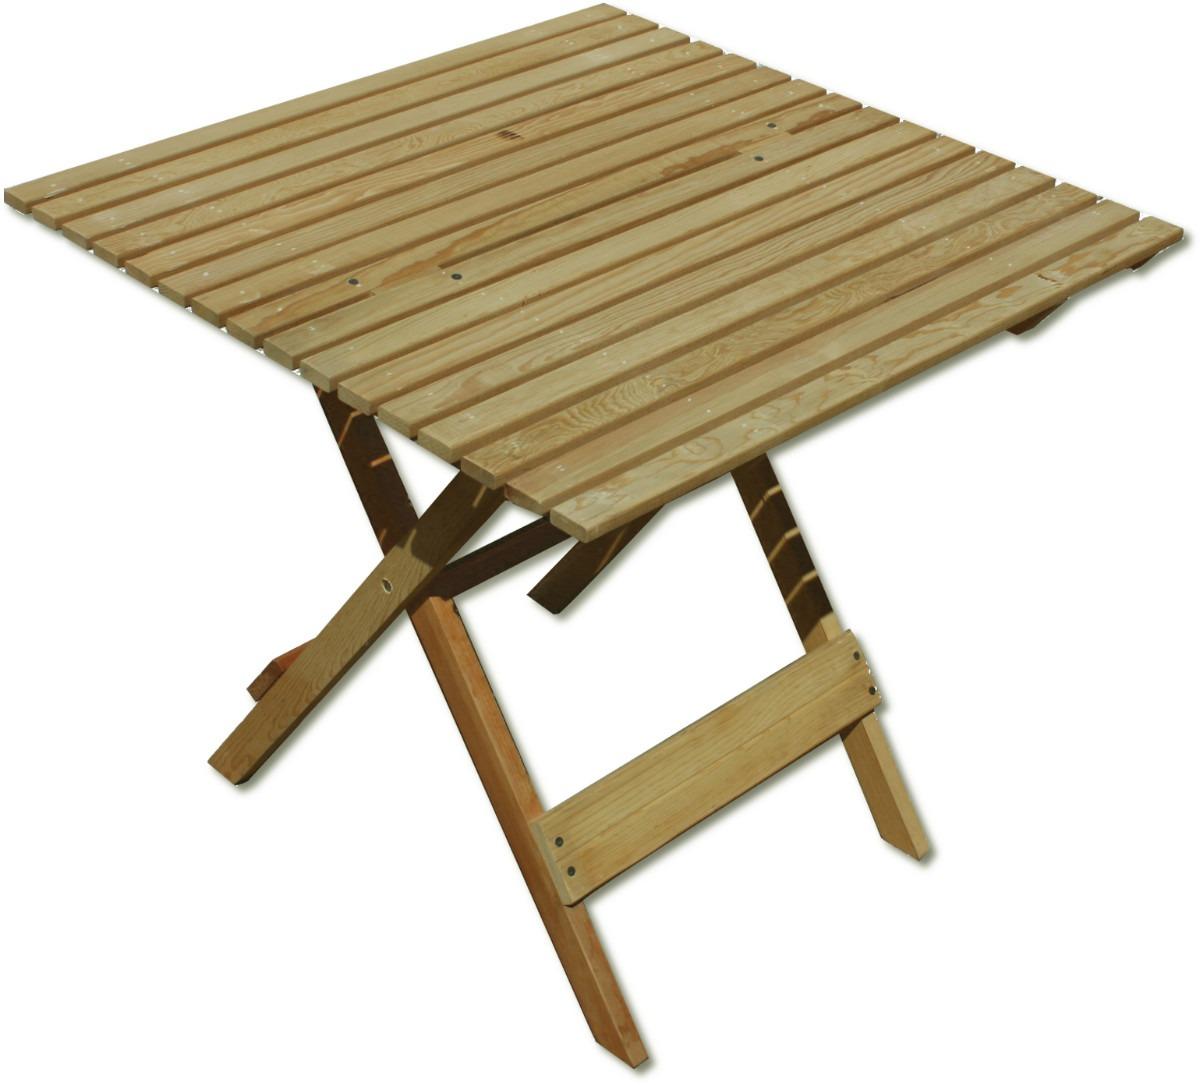 mesa de jard n mueble plegable madera jardin o interiores